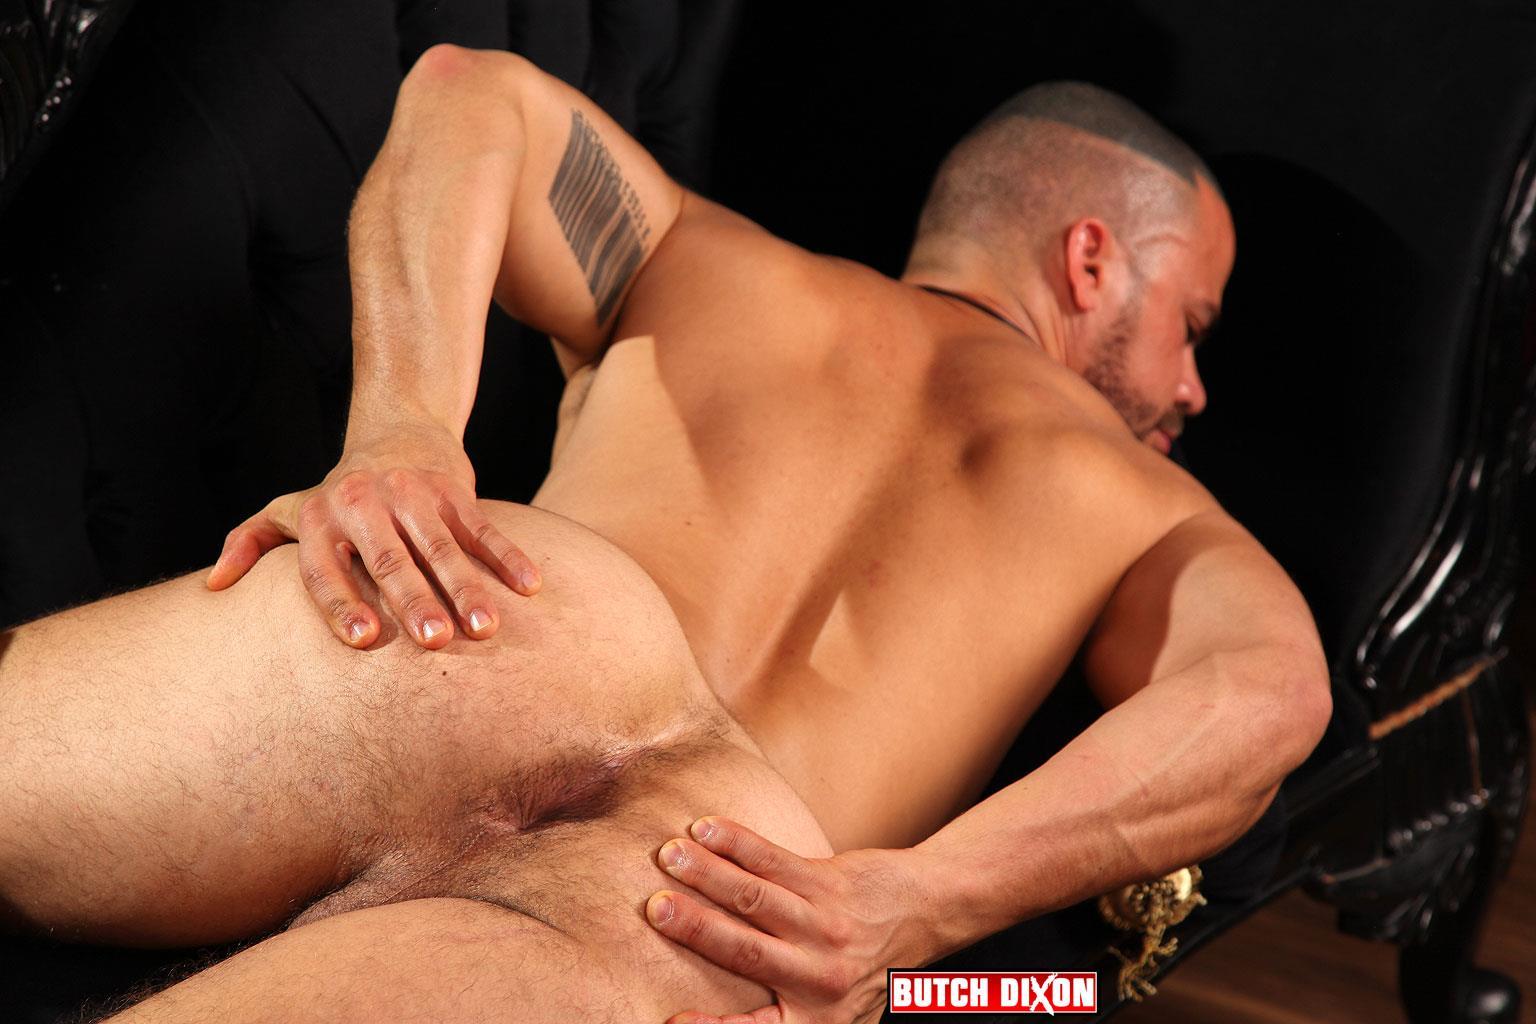 Butch-Dixon-Delta-Kobra-Muscle-Hunk-With-A-Big-Uncut-Cock-Jerking-Off-Amateur-Gay-Porn-15 Amateur Muscle Hunk Delta Kobra Jerks His Big Thick Uncut Cock